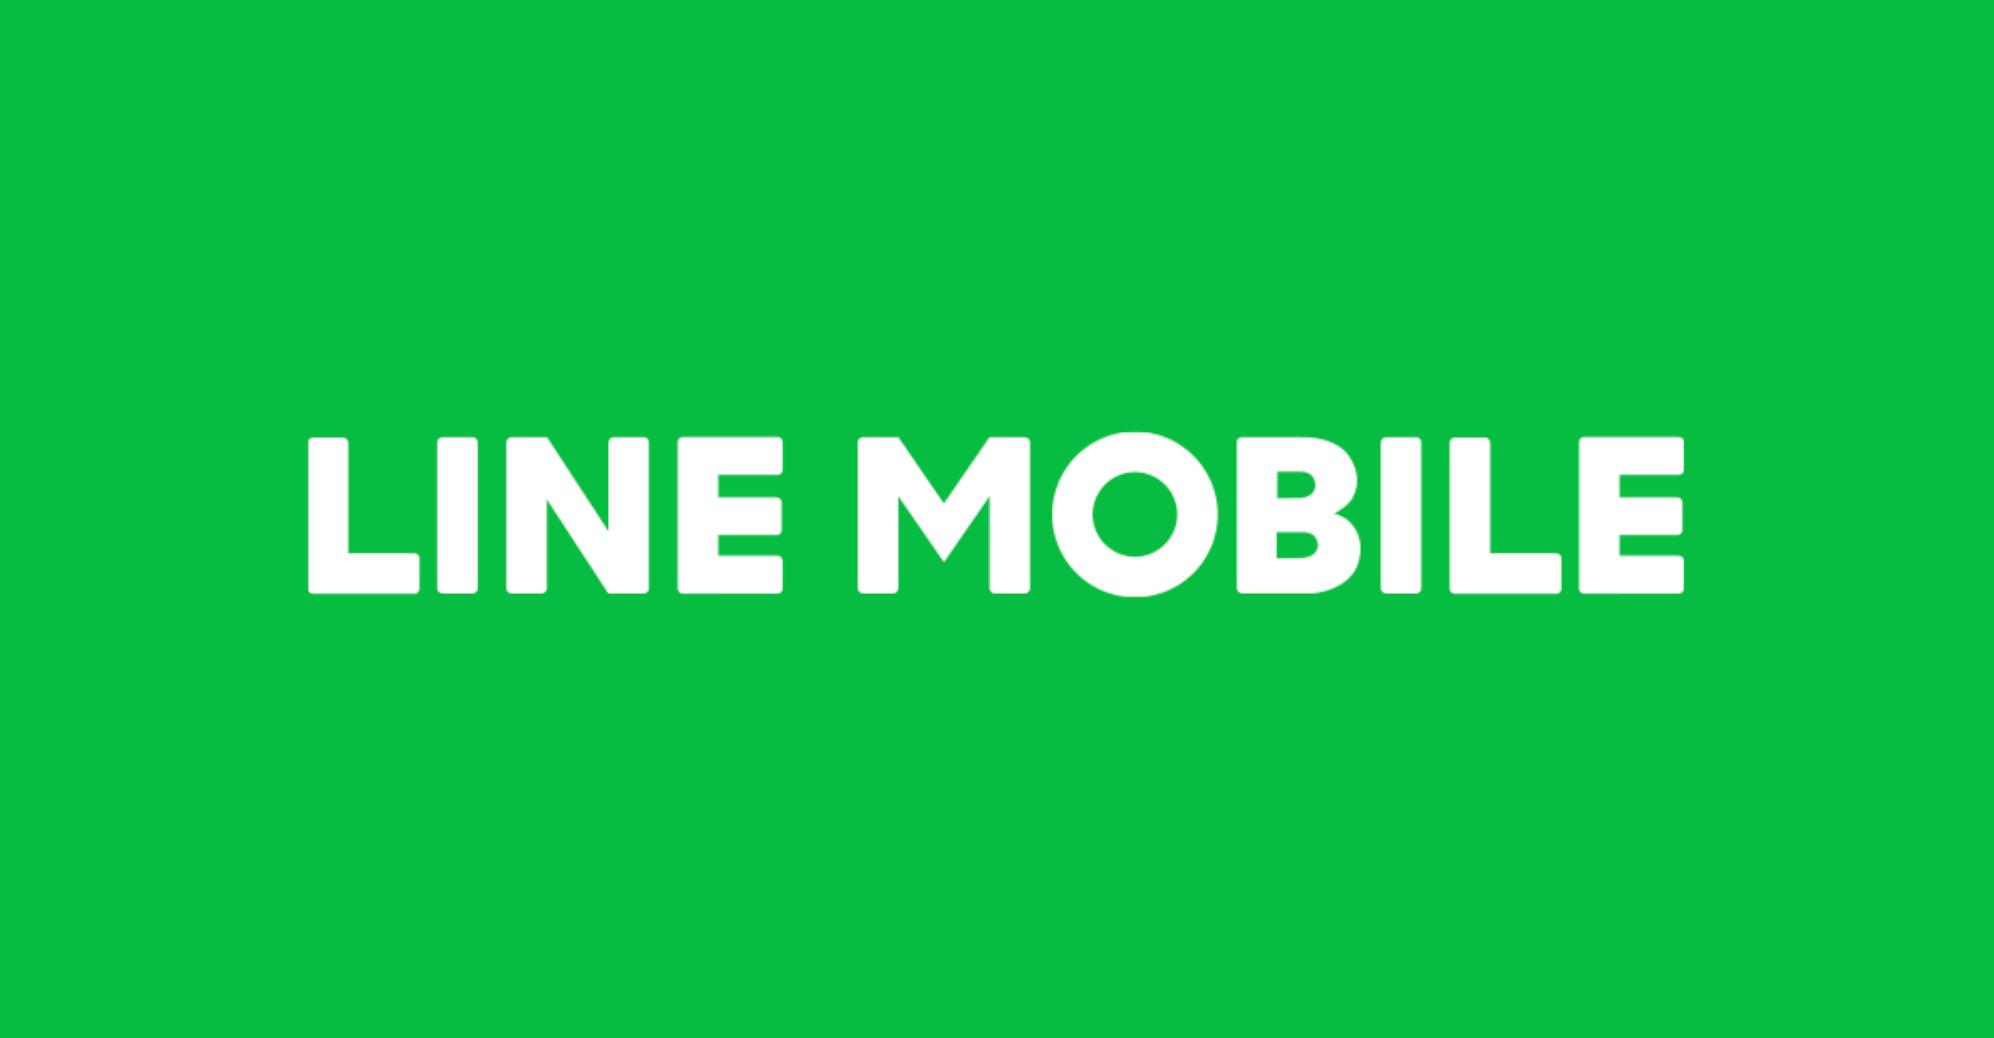 【LINEモバイルレビュー】2ヶ月目の請求金額を公開!通信速度は問題ない?